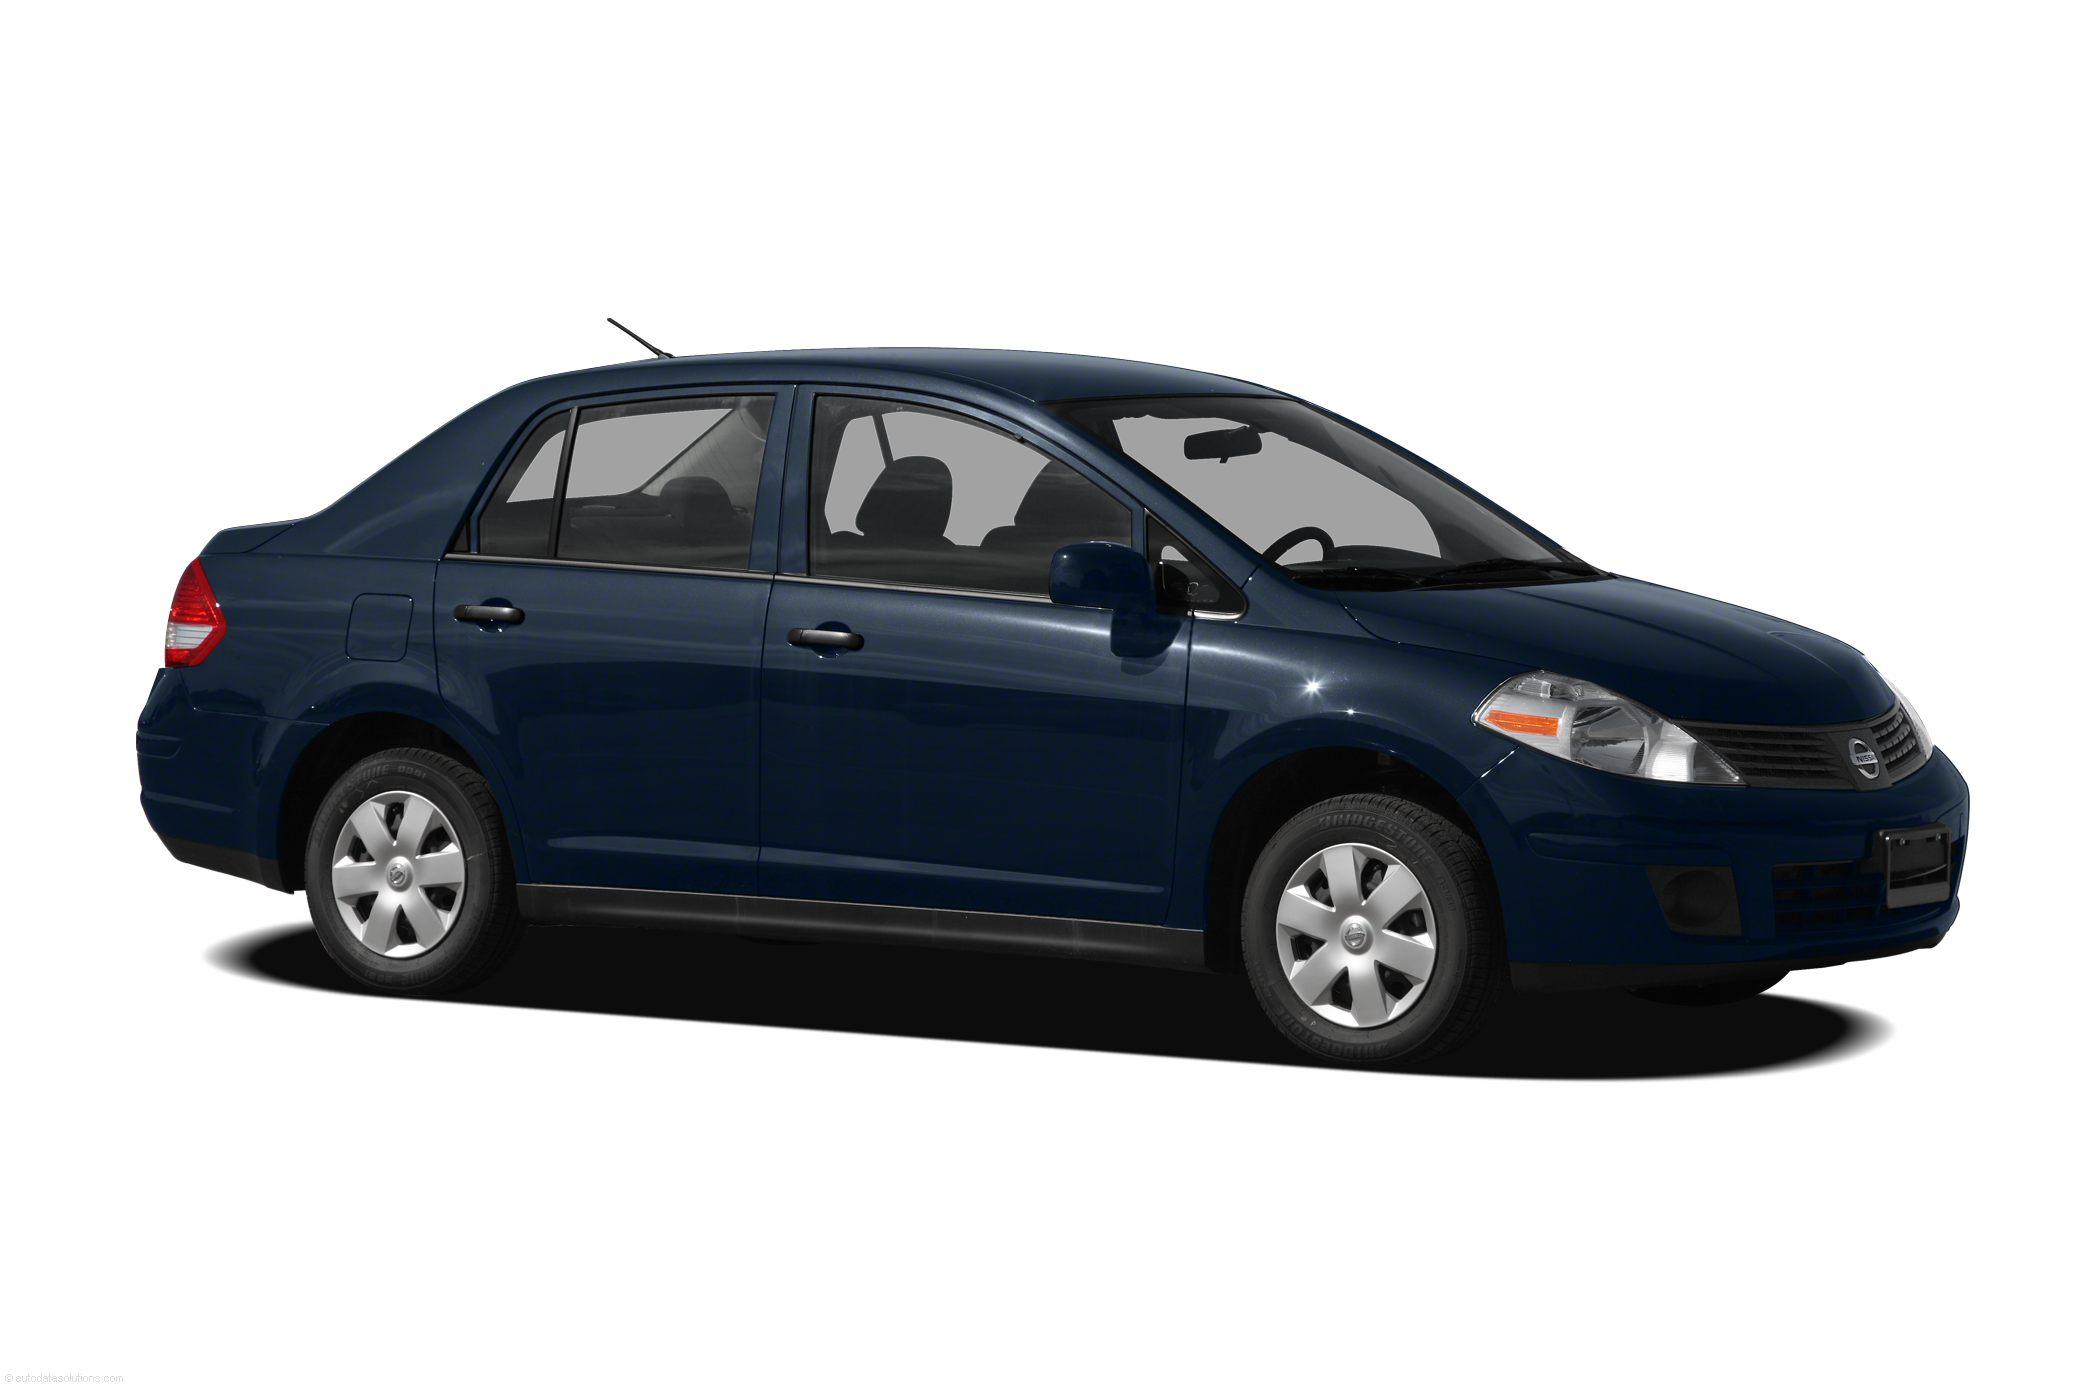 2011 Nissan Versa Image 14